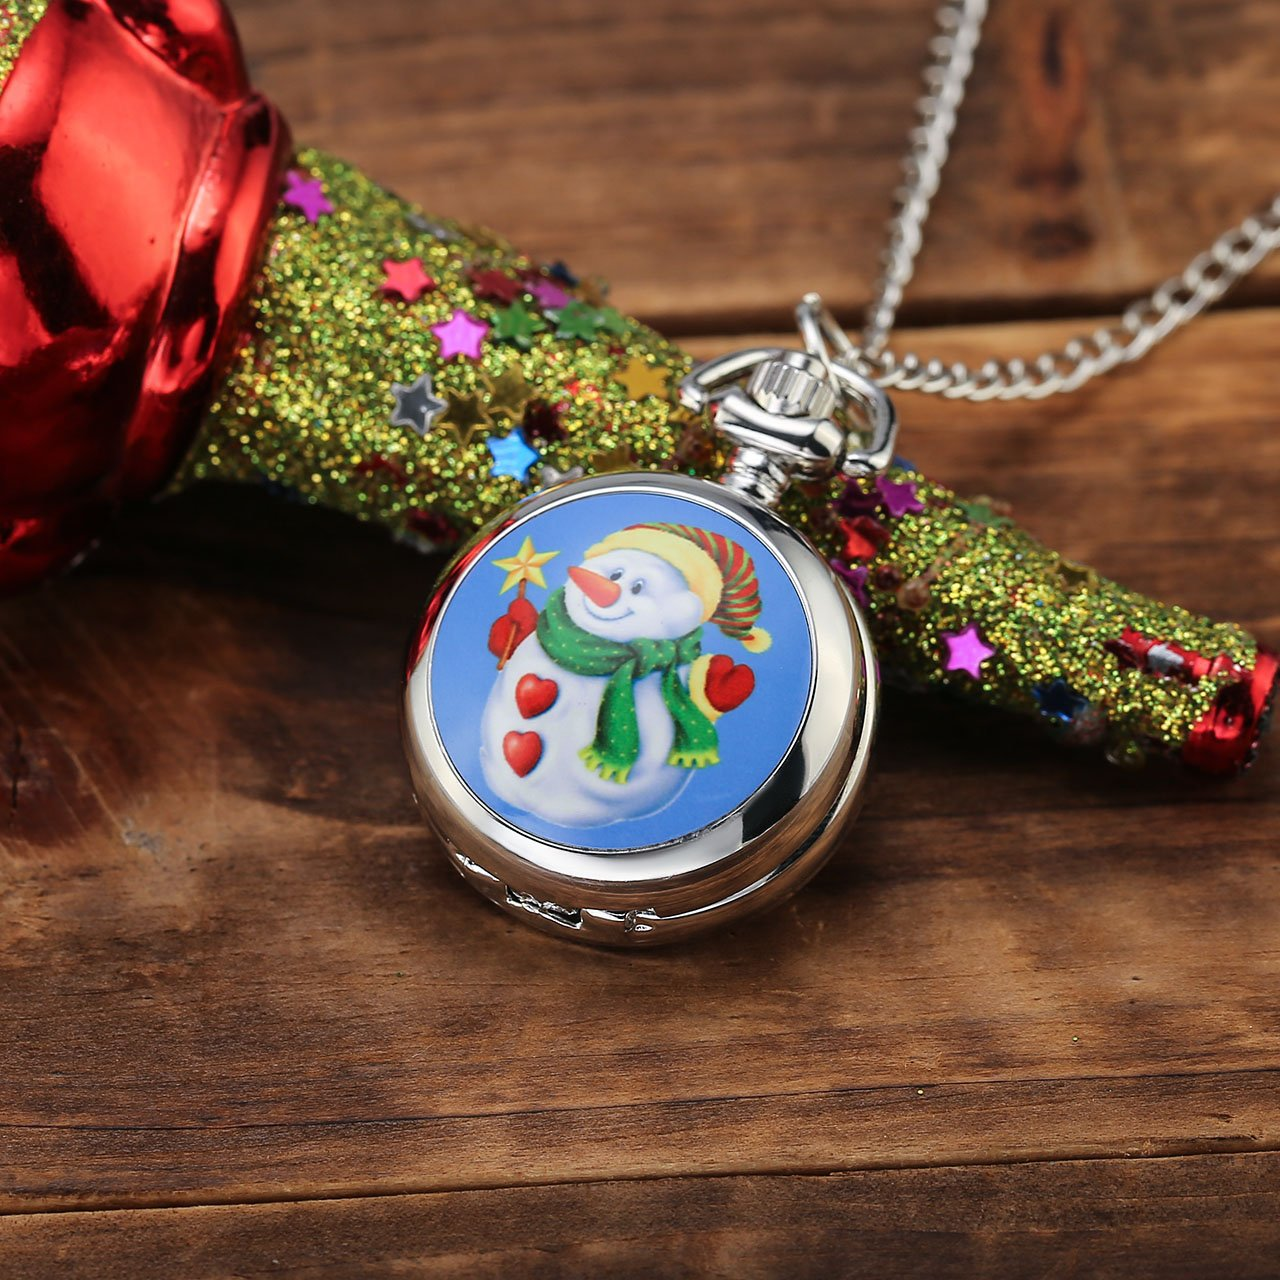 Top Plaza Christmas Gifts Snowman Santa Claus Silver Retro Quartz Analog Fob Pocket Watches Pendant Neckalce With Chain for Kids(Snowman)